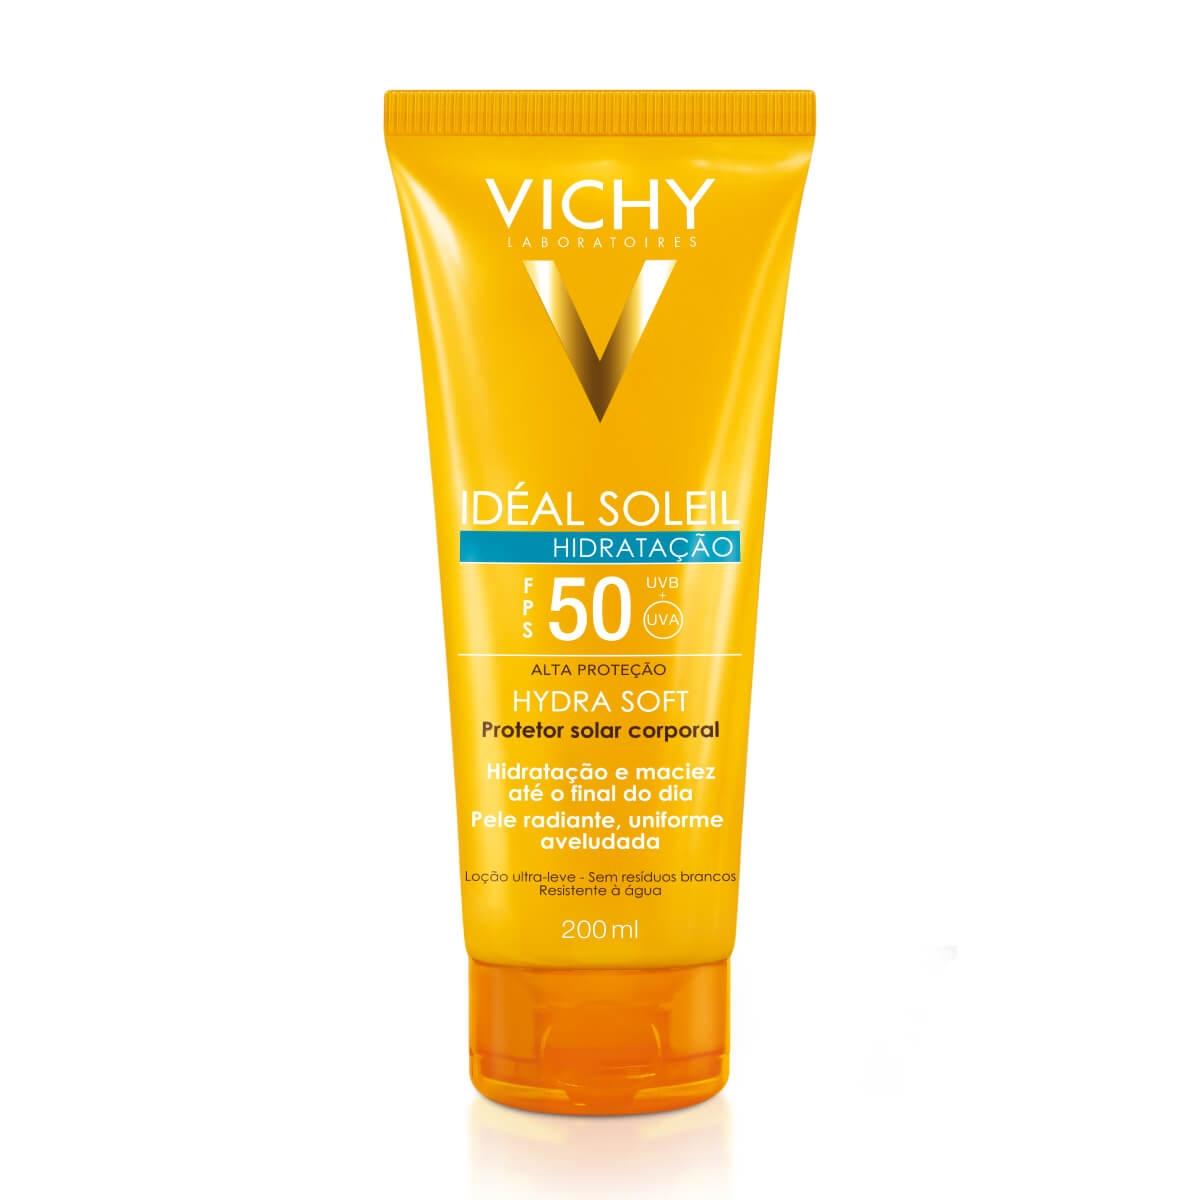 Protetor Solar Corporal Vichy Idéal Soleil Hydra Soft FPS 50 com 200ml 200ml